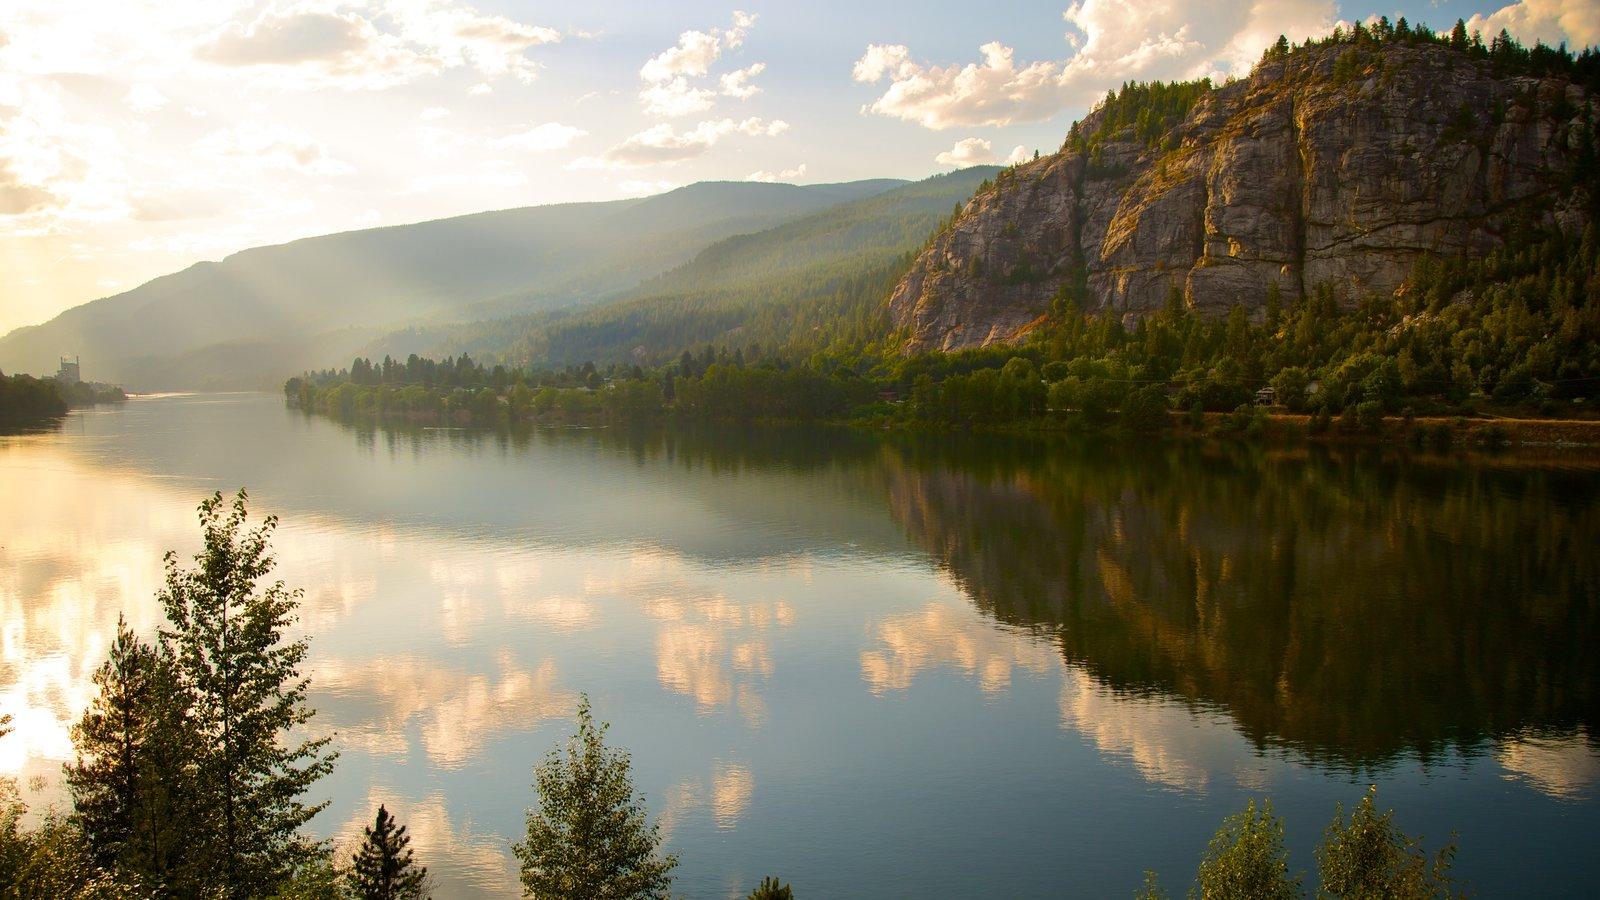 Castlegar featuring a lake or waterhole